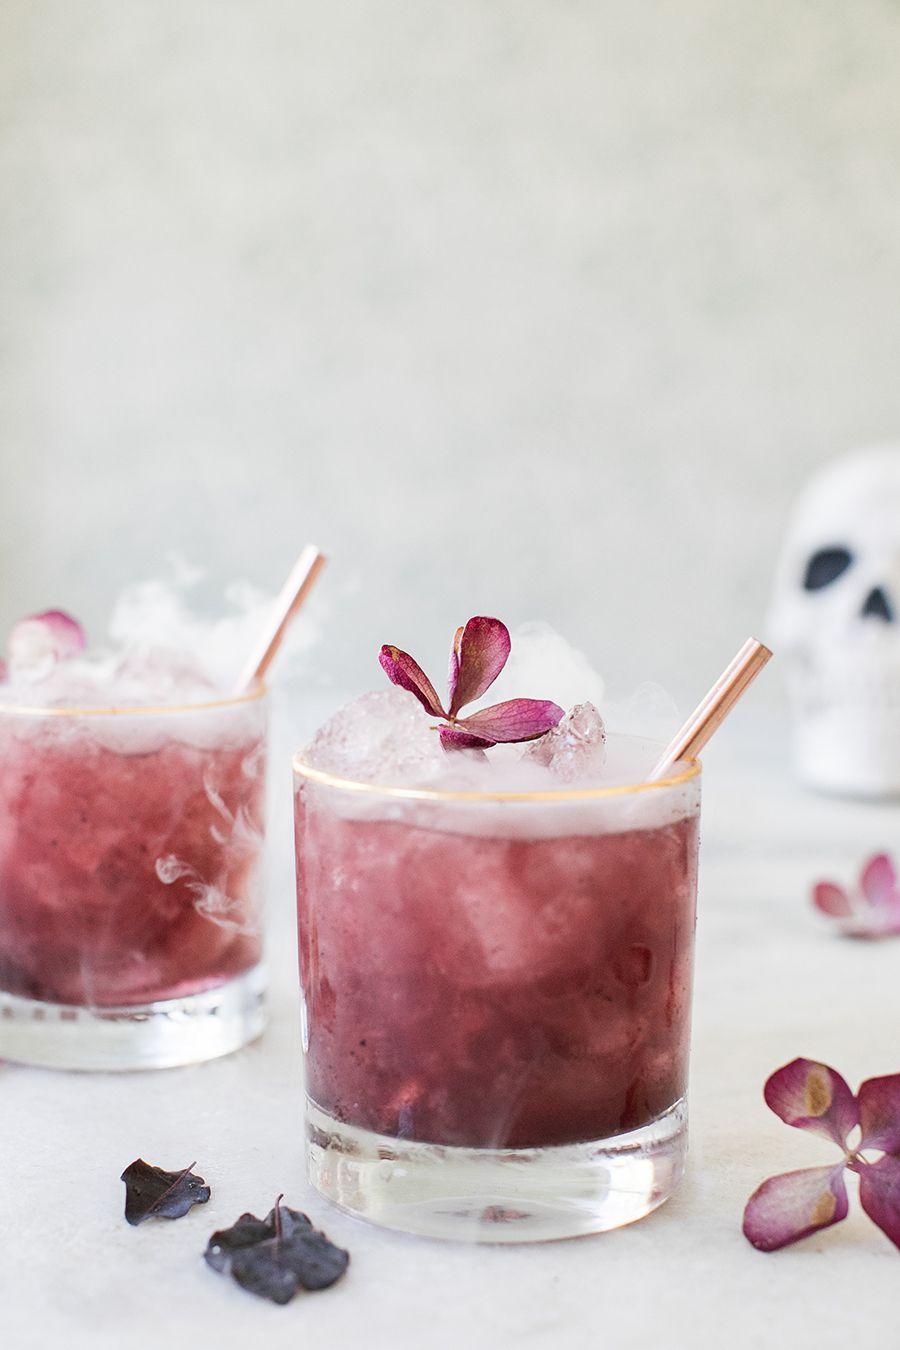 Purple Gin And Tonics A Spooky Halloween Cocktail Sugar And Charm Rezept Gin Und Tonic Lebensmittel Lebensmittel Essen